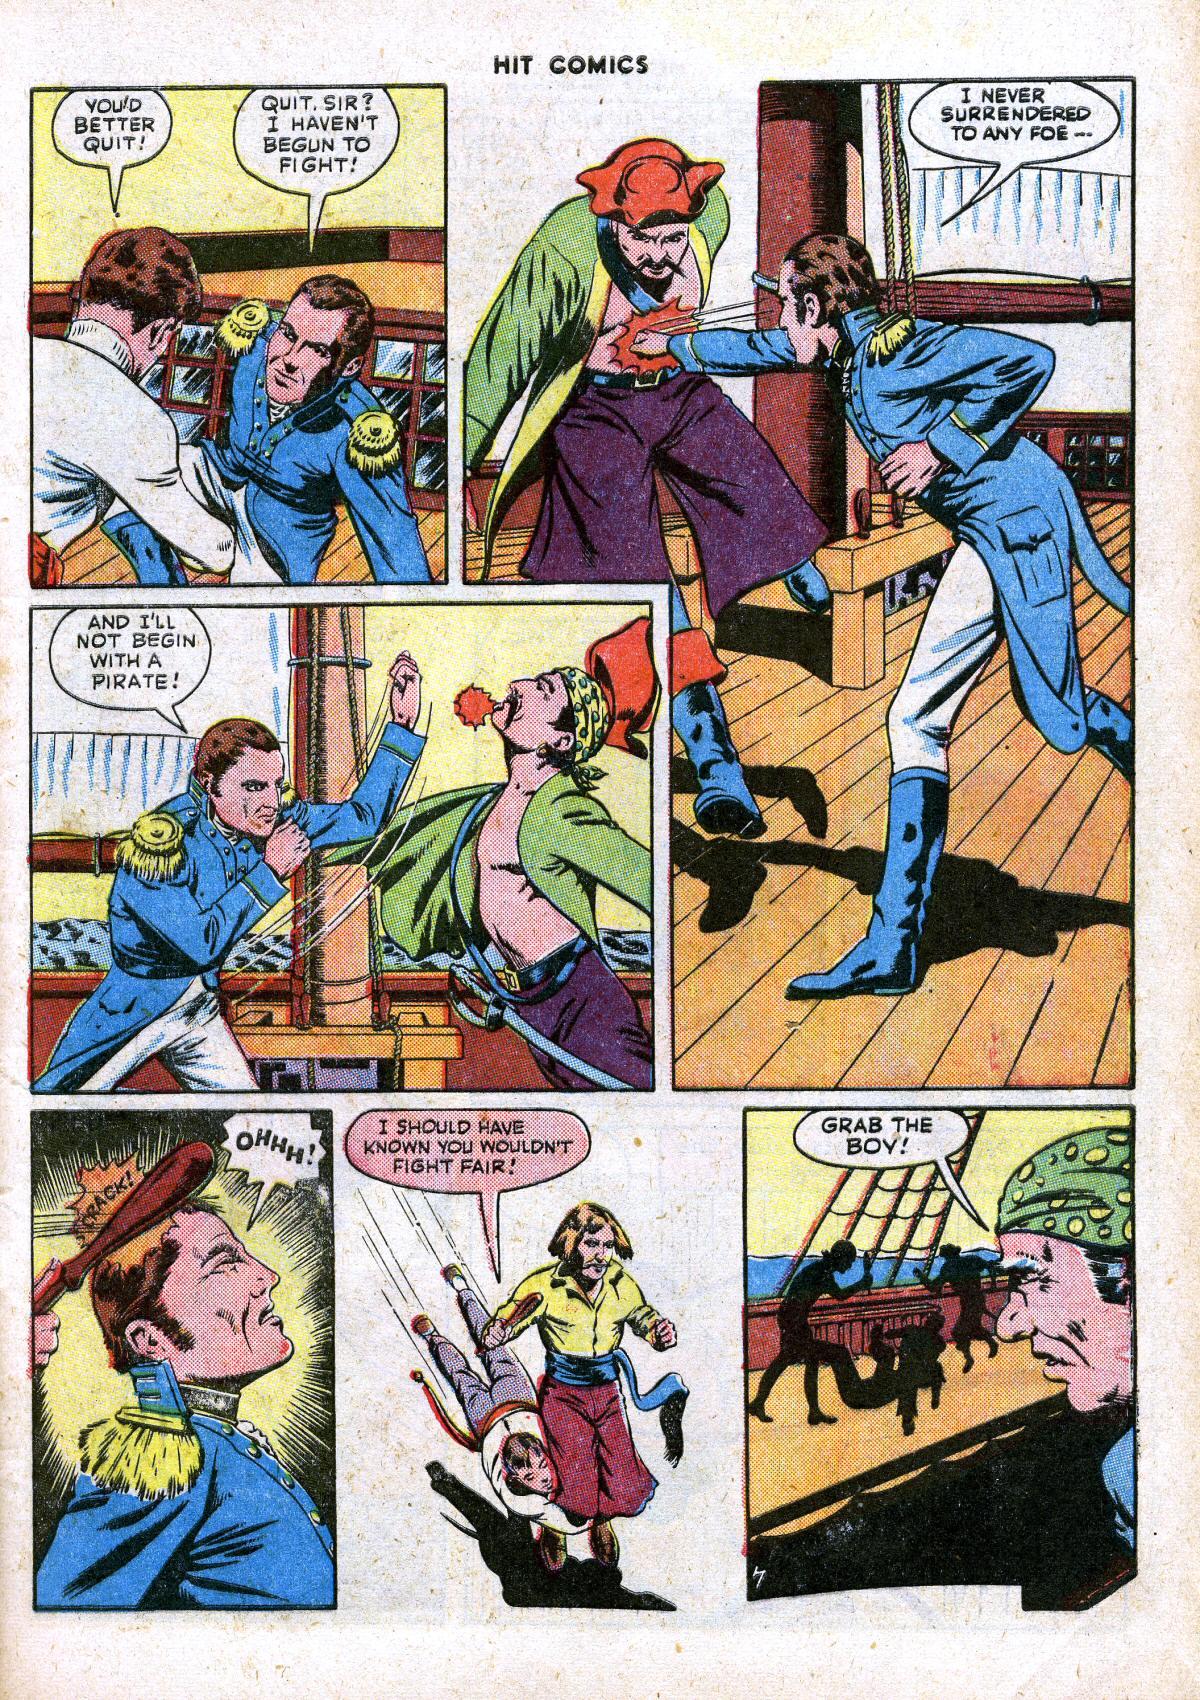 Read online Hit Comics comic -  Issue #41 - 9